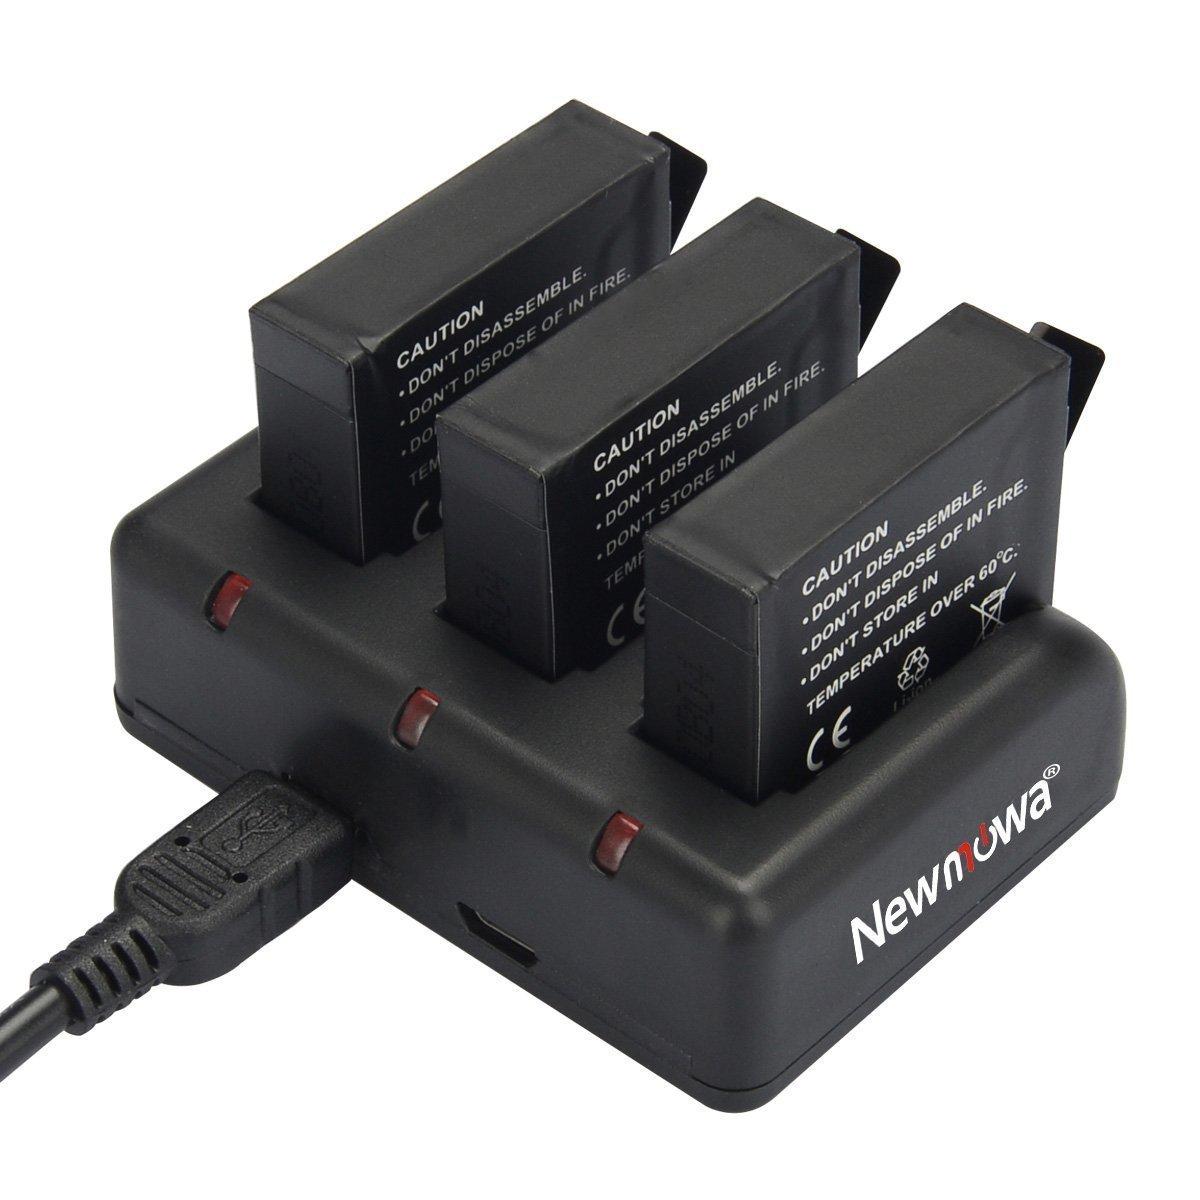 Gopro Hero 3+ Gopro Hero4 Newmowa Rapide 3 canaux Chargeur pour Gopro Hero 3 AHDBT-401 Rapide 3 canaux Chargeur AHDBT-301 AHDBT-302